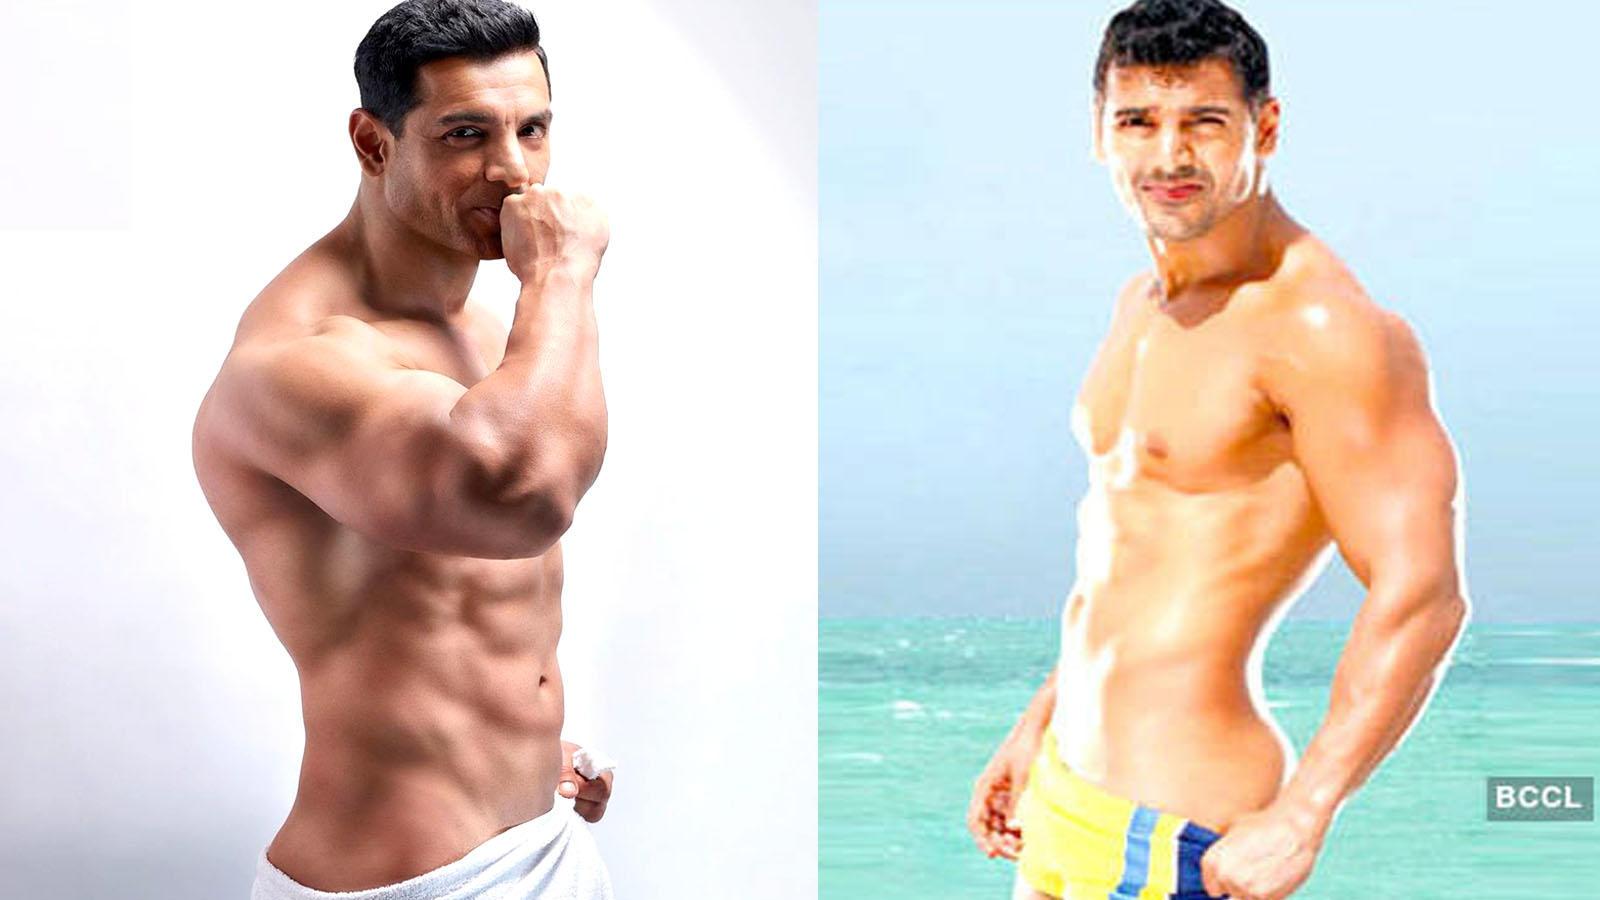 john-abraham-recreates-dostana-pose-flaunts-his-chiseled-body-for-the-ace-photographer